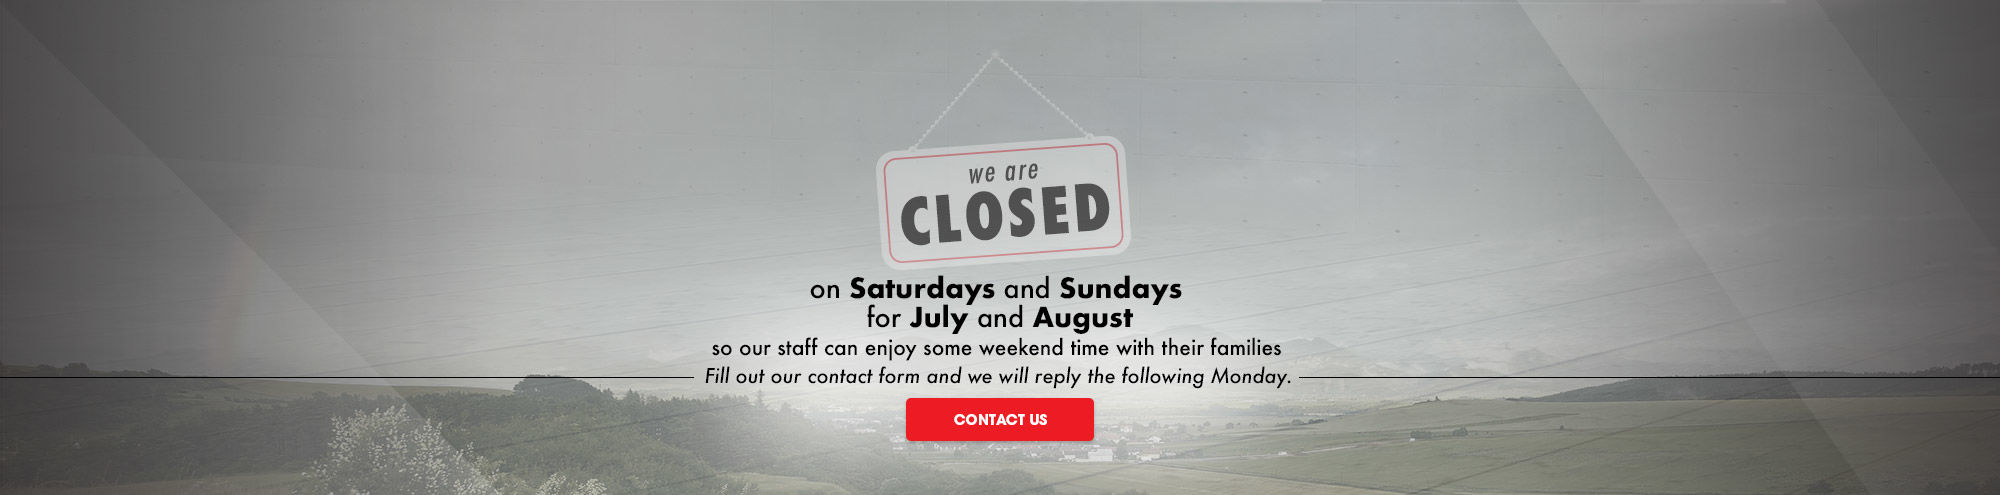 We are closed on Saturdays and Sundays